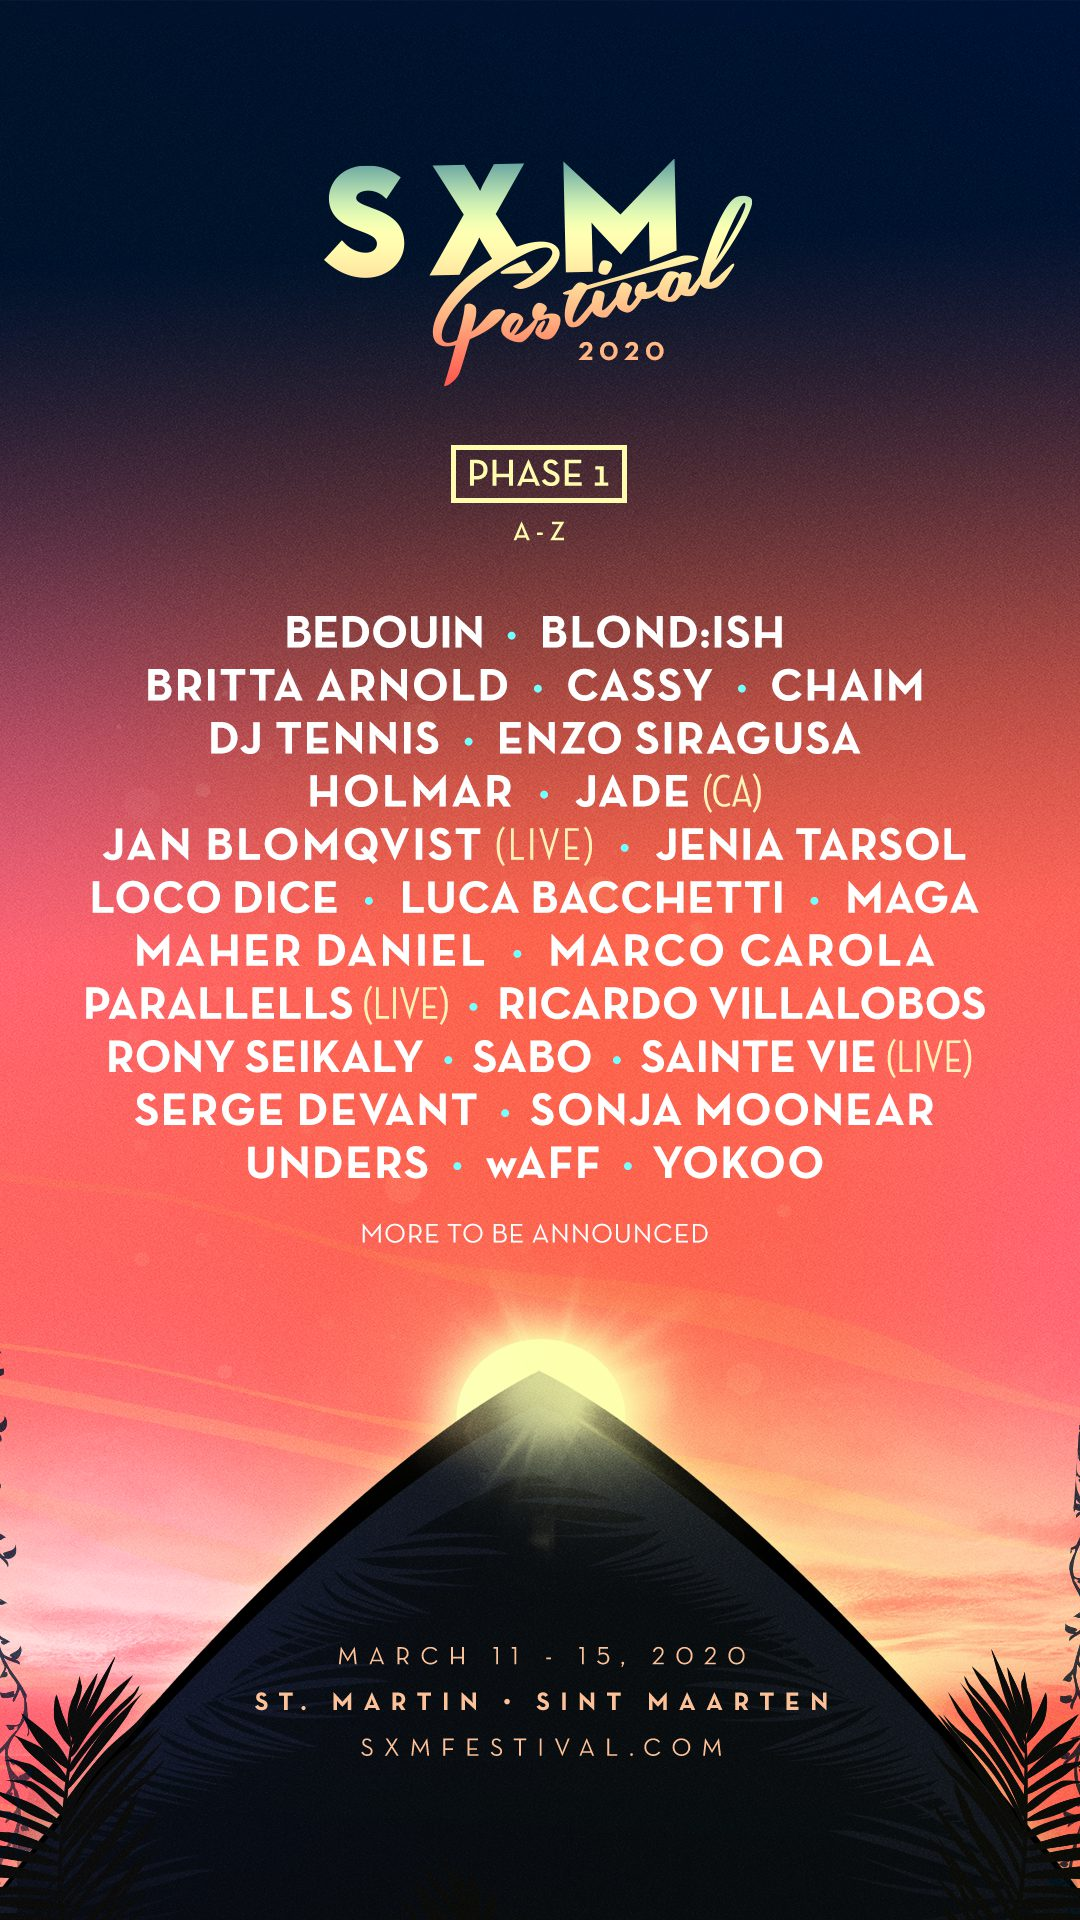 SXM Festival 2020 - Phase 1 Lineup